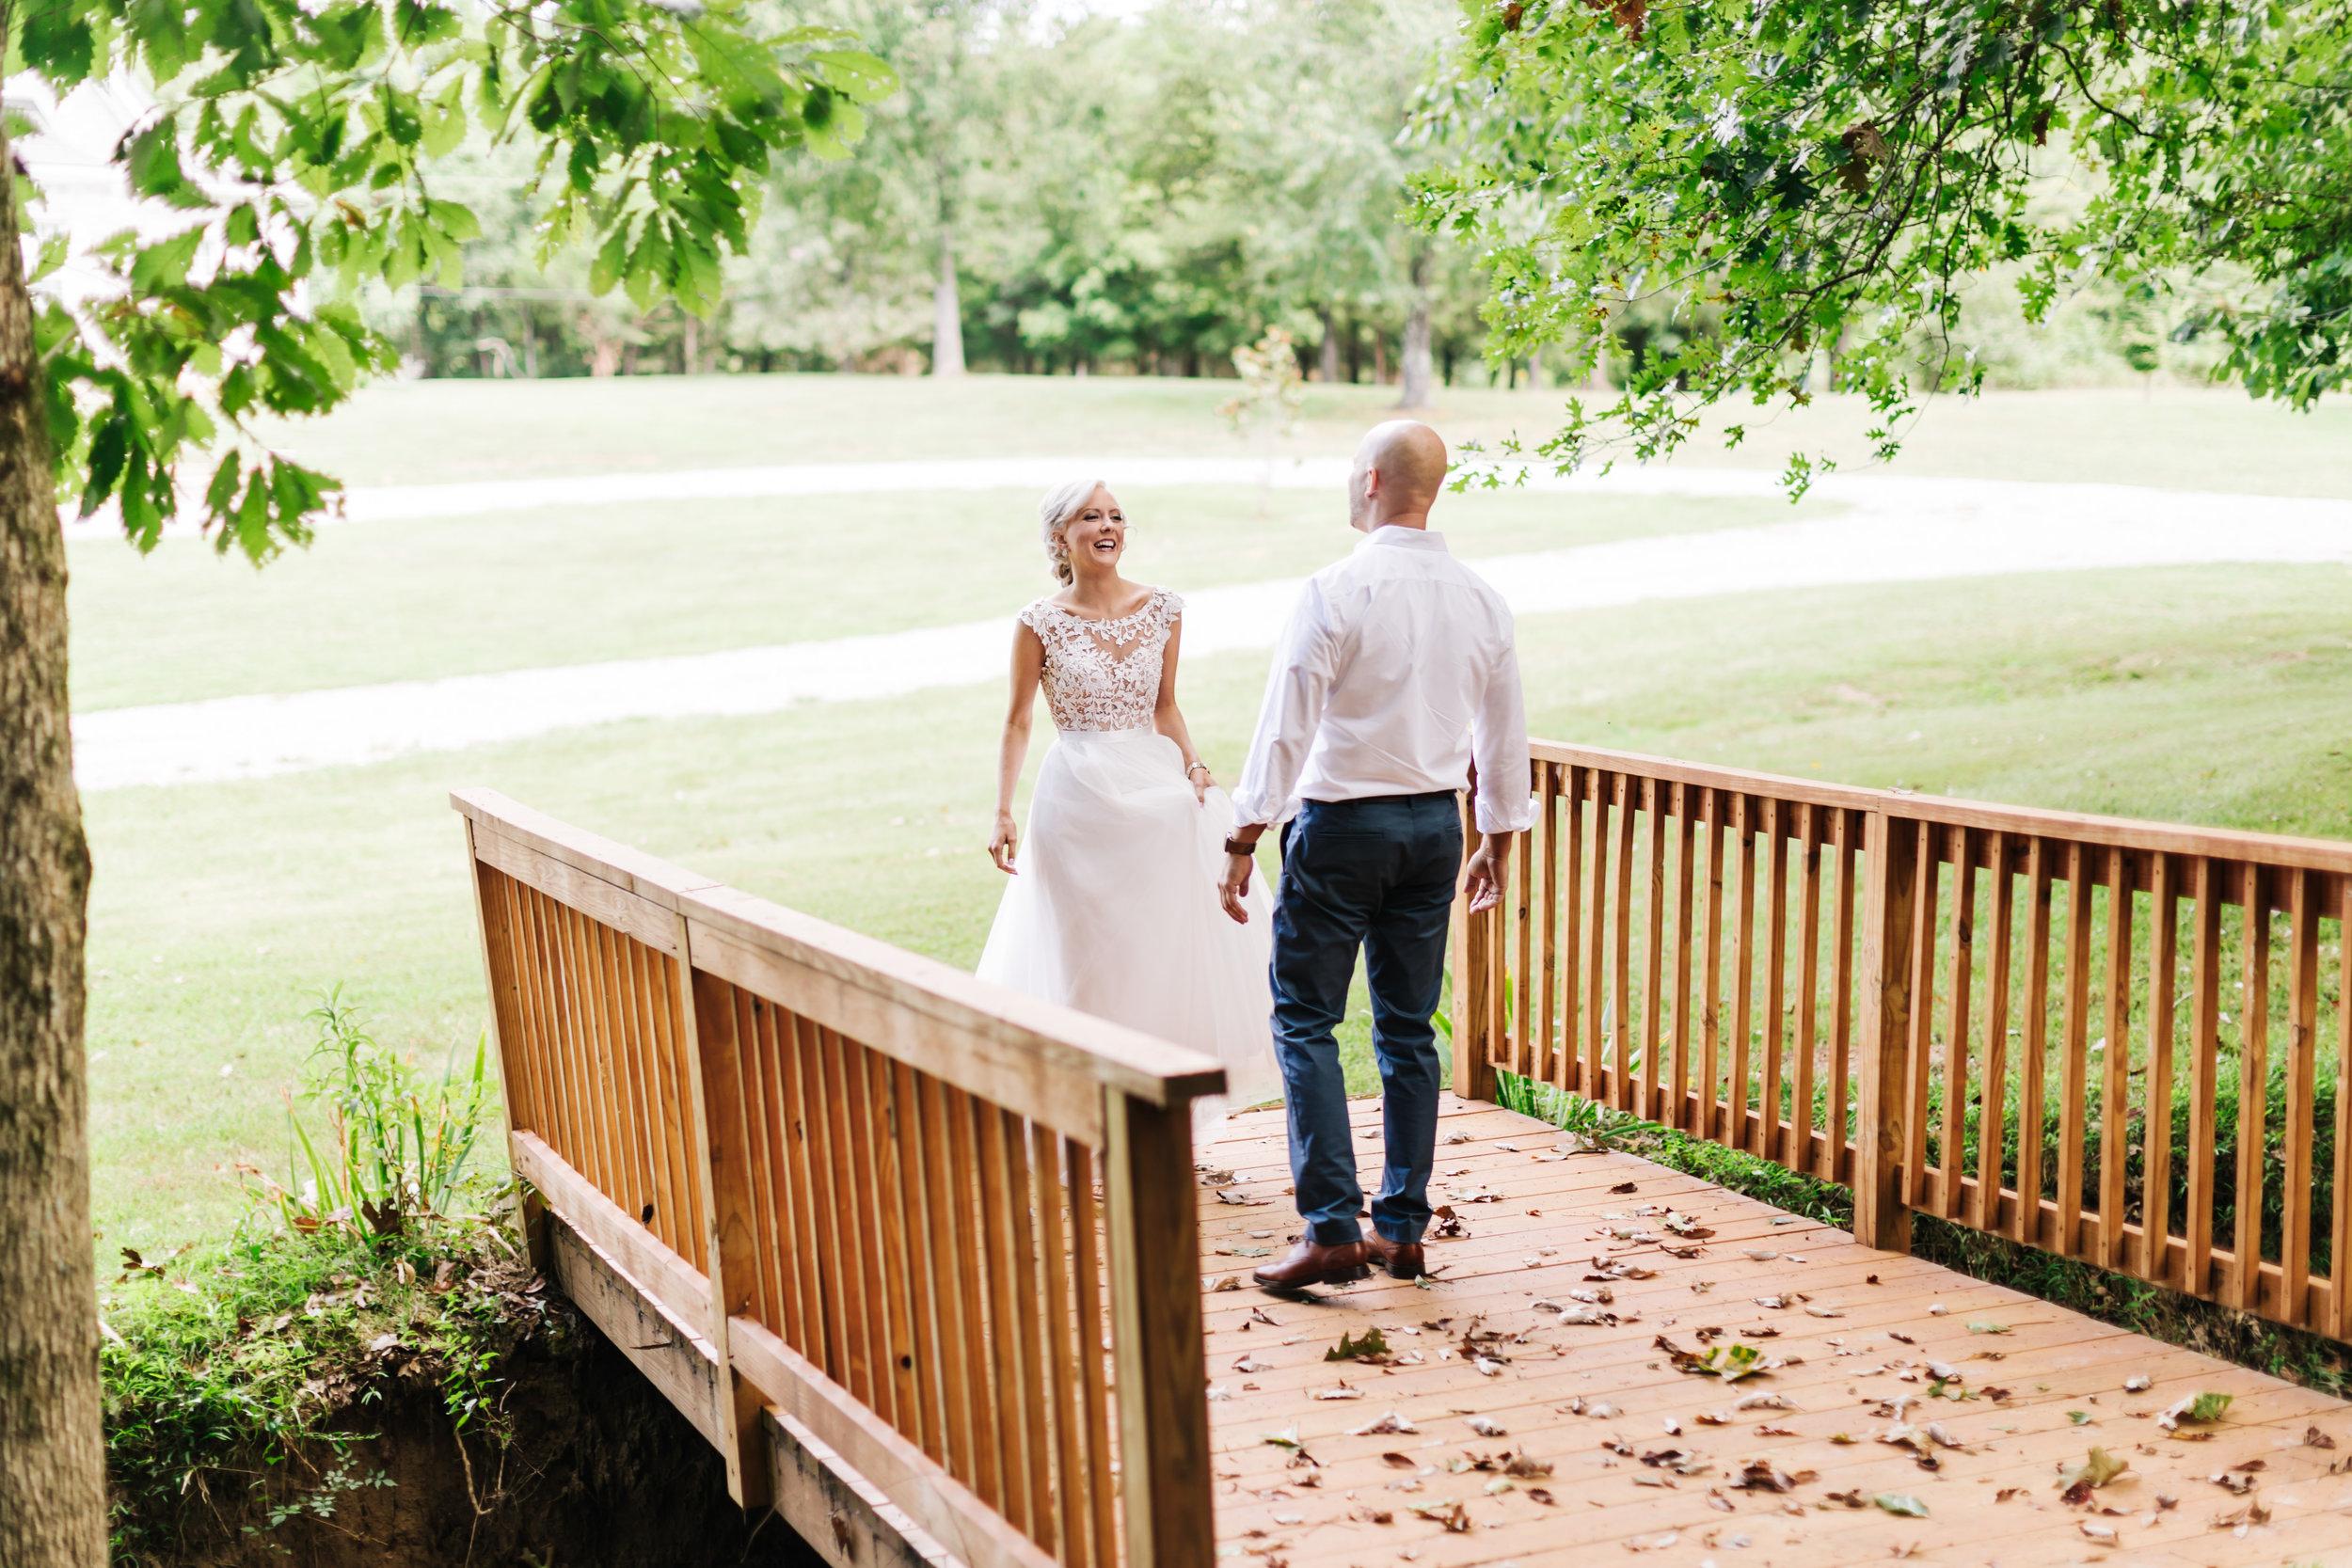 2018.09.02 Ray and Sarah Prizner Nashville TN Wedding FINALS-57.jpg